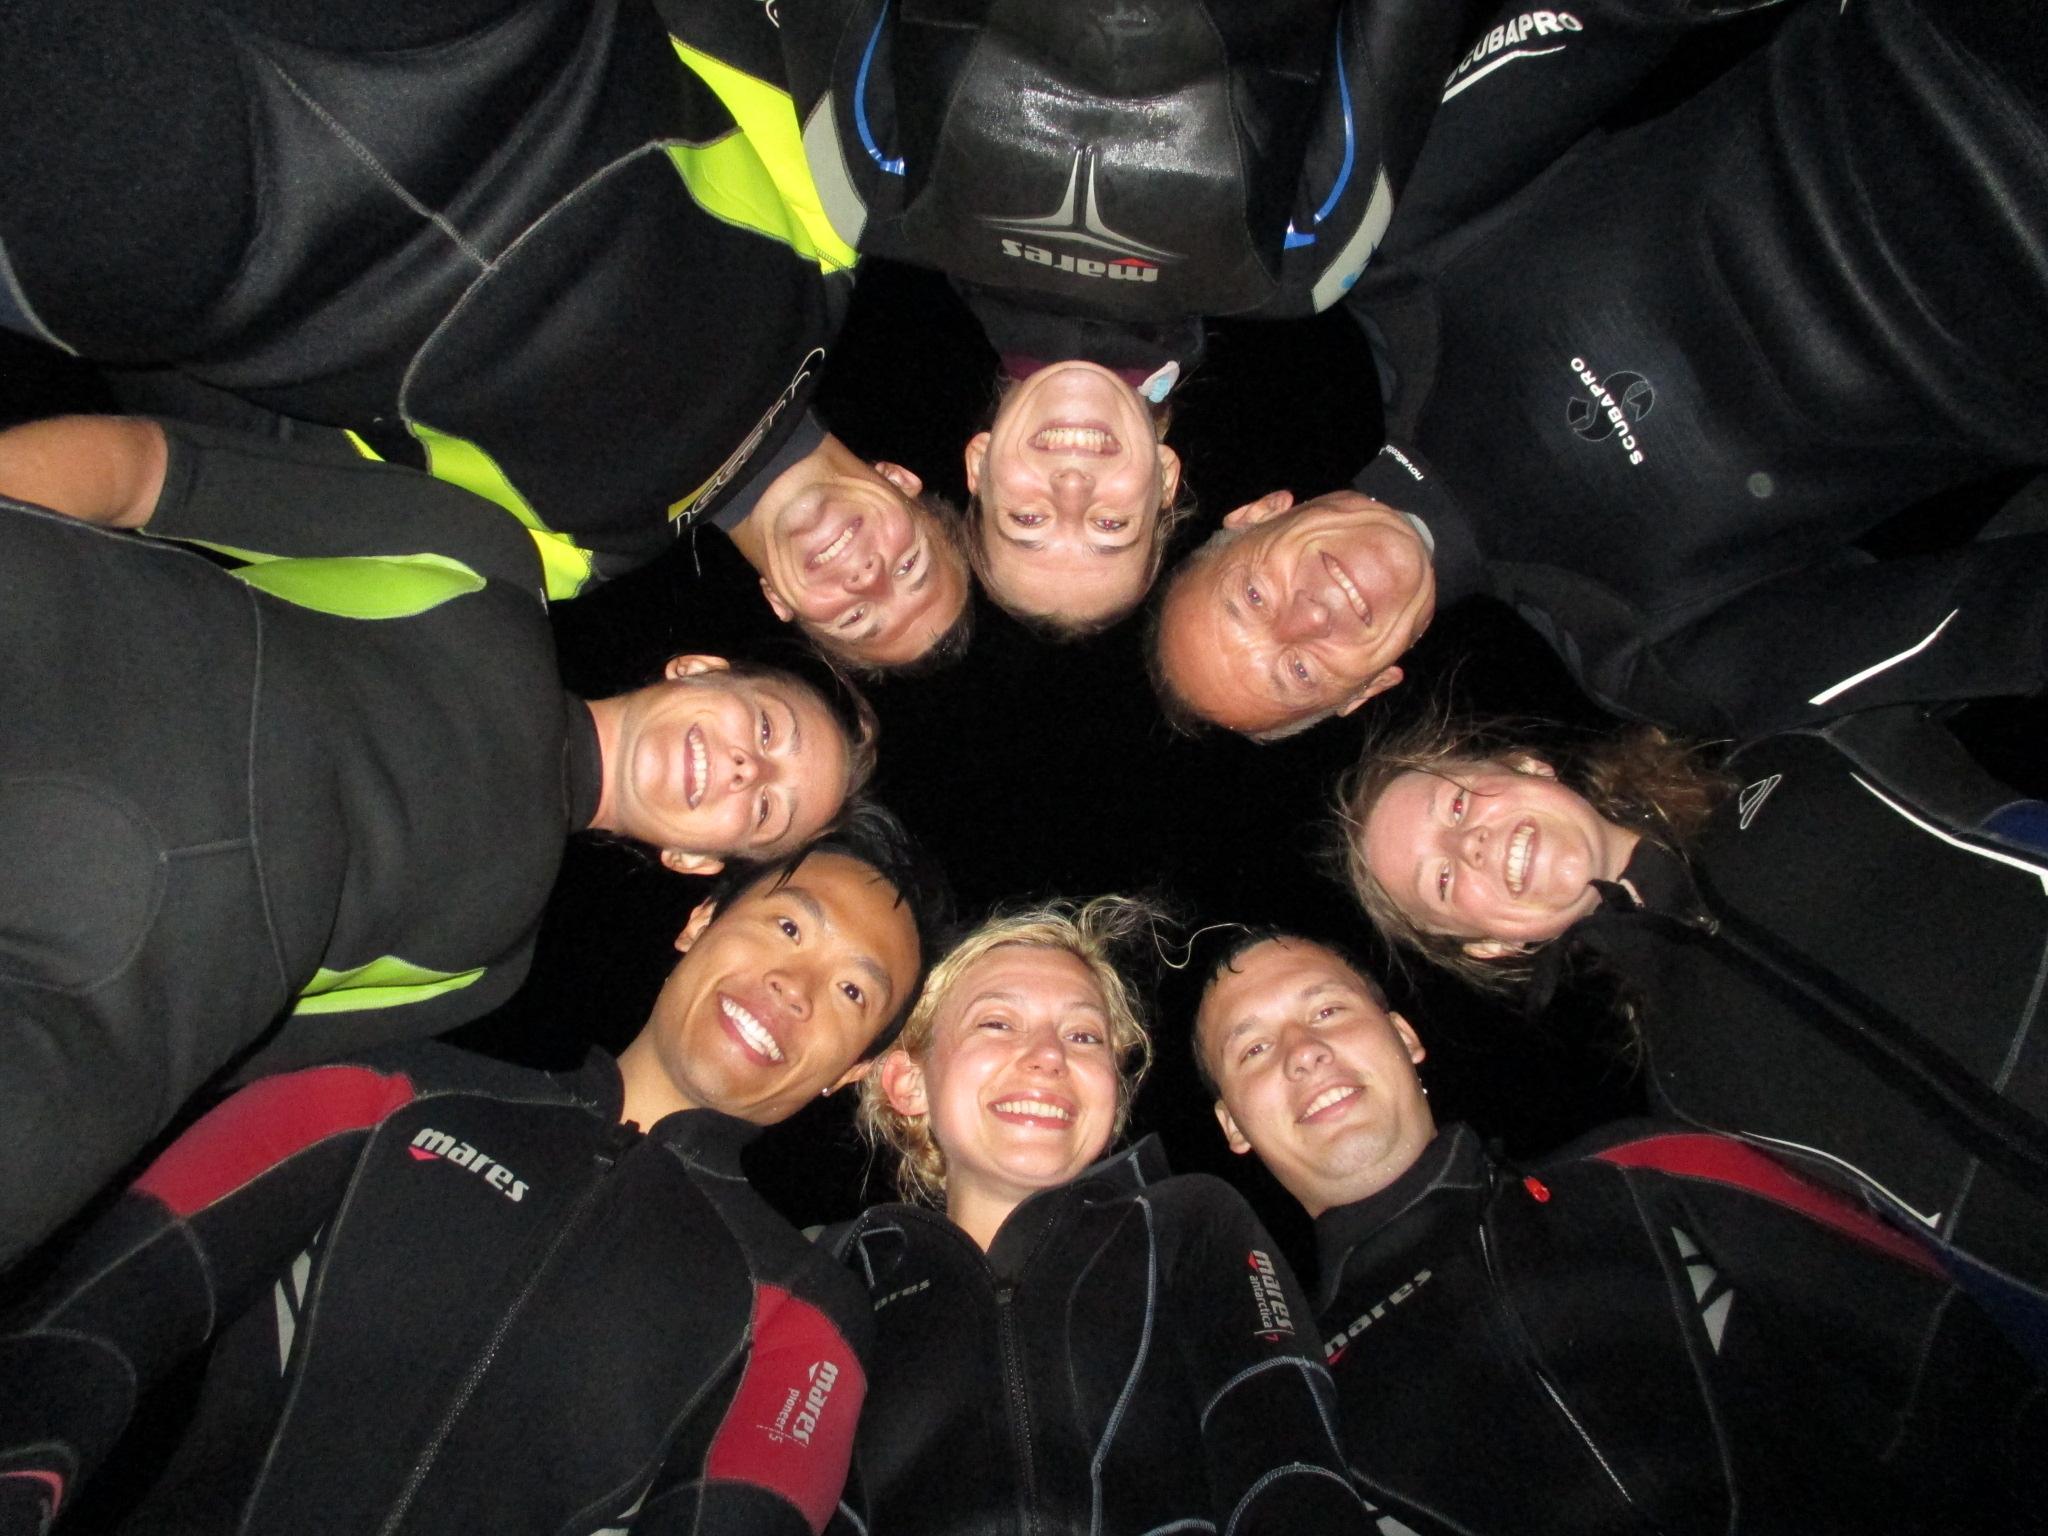 Tenerife Diving academy